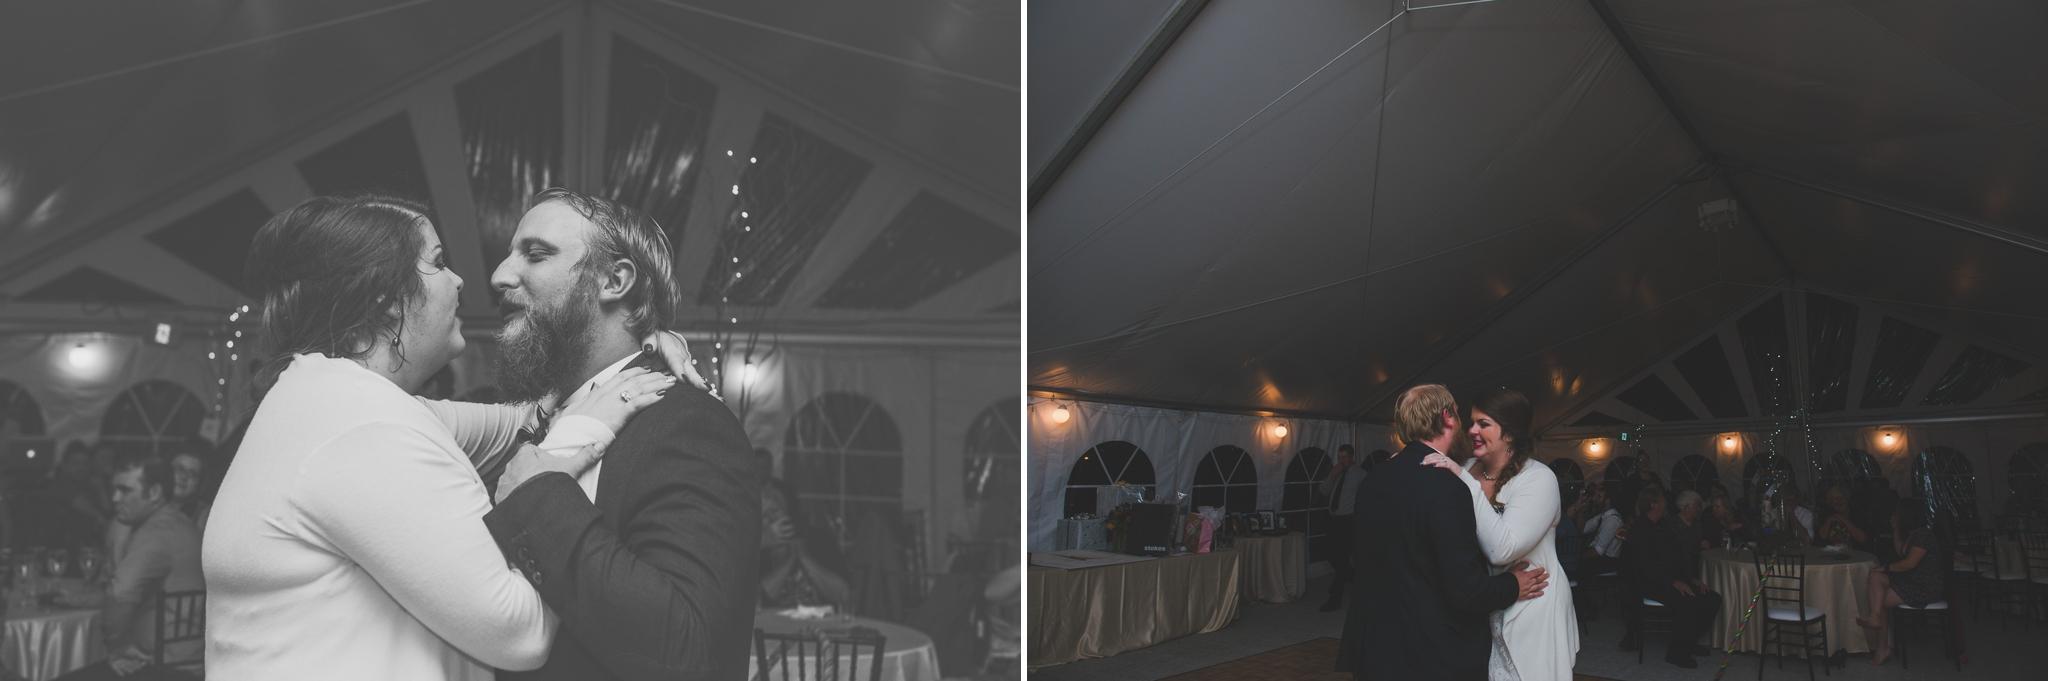 fall wedding, autumn wedding, rainy wedding, rainy day, penryn mansion, port hope, port hope ontario, northumberland, port hope wedding, port hope wedding photographer, toronto wedding photographer, northumberland wedding, northumberland wedding photographer, bride and groom, wedding portraits, wedding portrait, getting ready, baby, window light, black and white, portrait, outdoors, hedges, greenery, bride, groom, ivy, stormy skies, stormy sky, rain, reception, party, speeches, dance, hula hoops